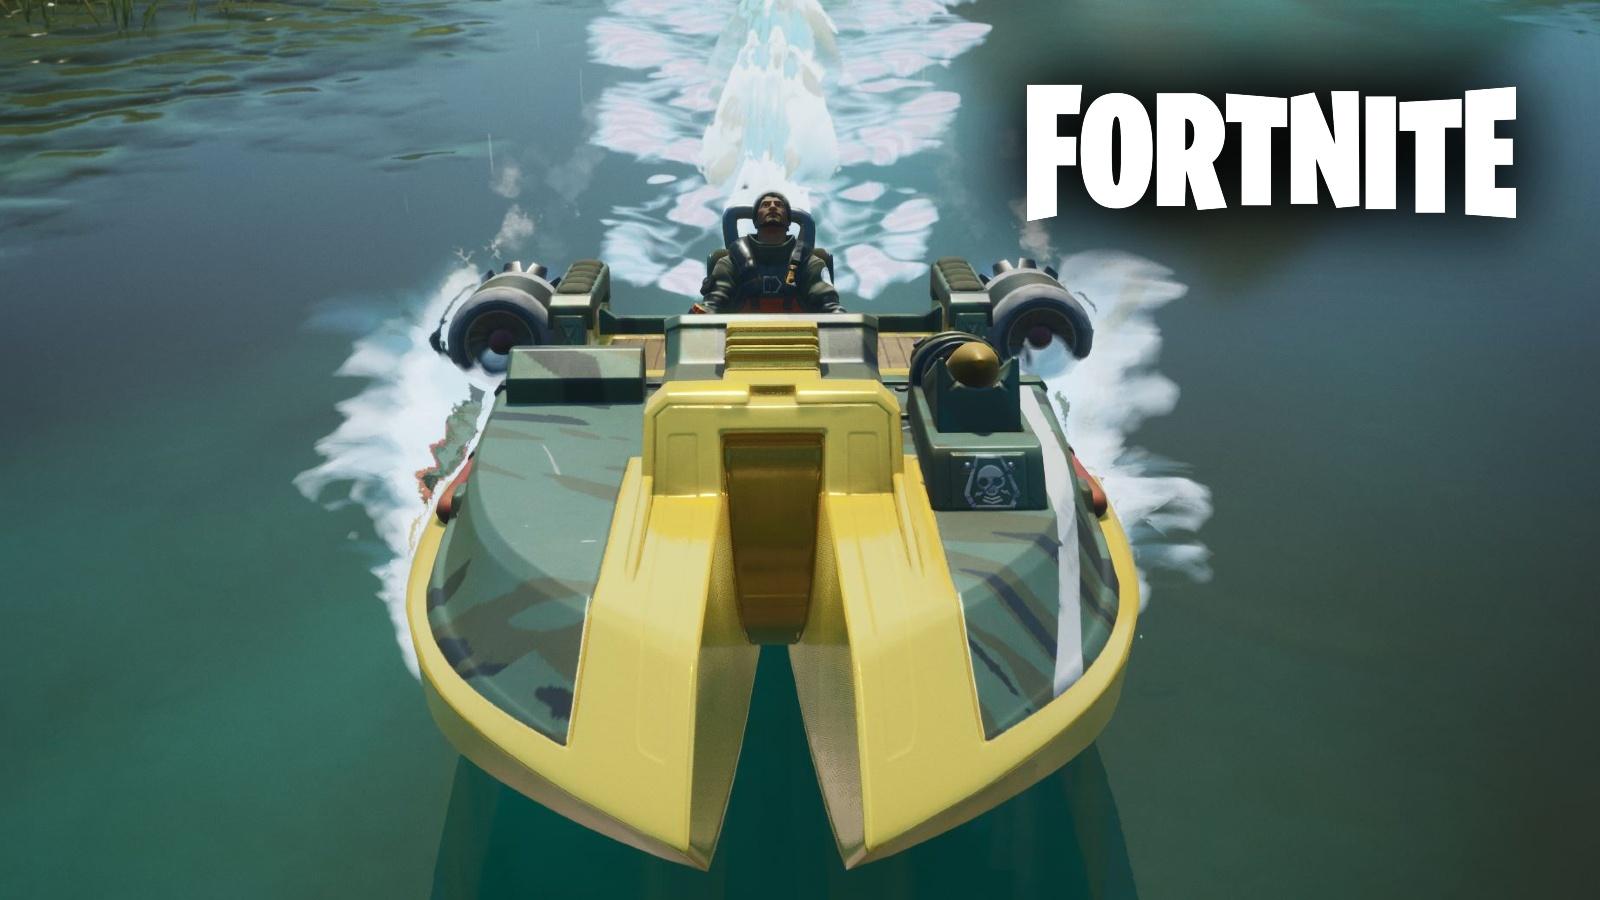 Fortnite logo with gold motorboat